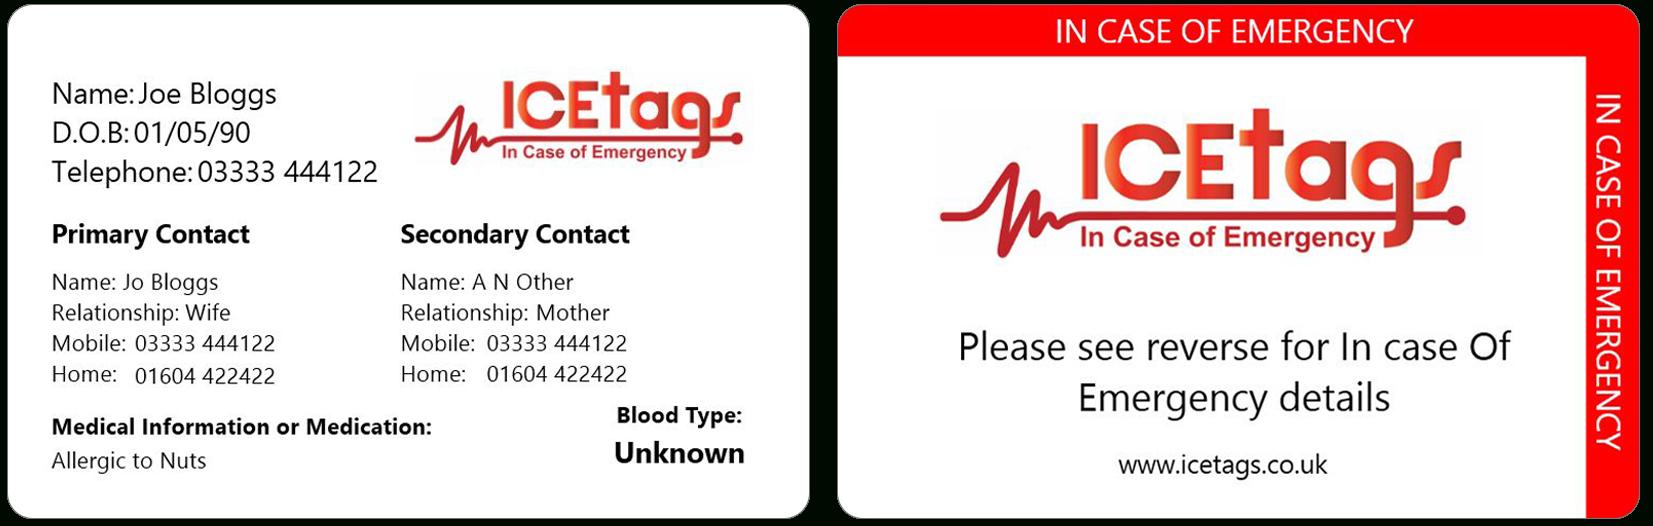 In Case Of Emergency Card  Wallet Card  Free Delivery With In Case Of Emergency Card Template